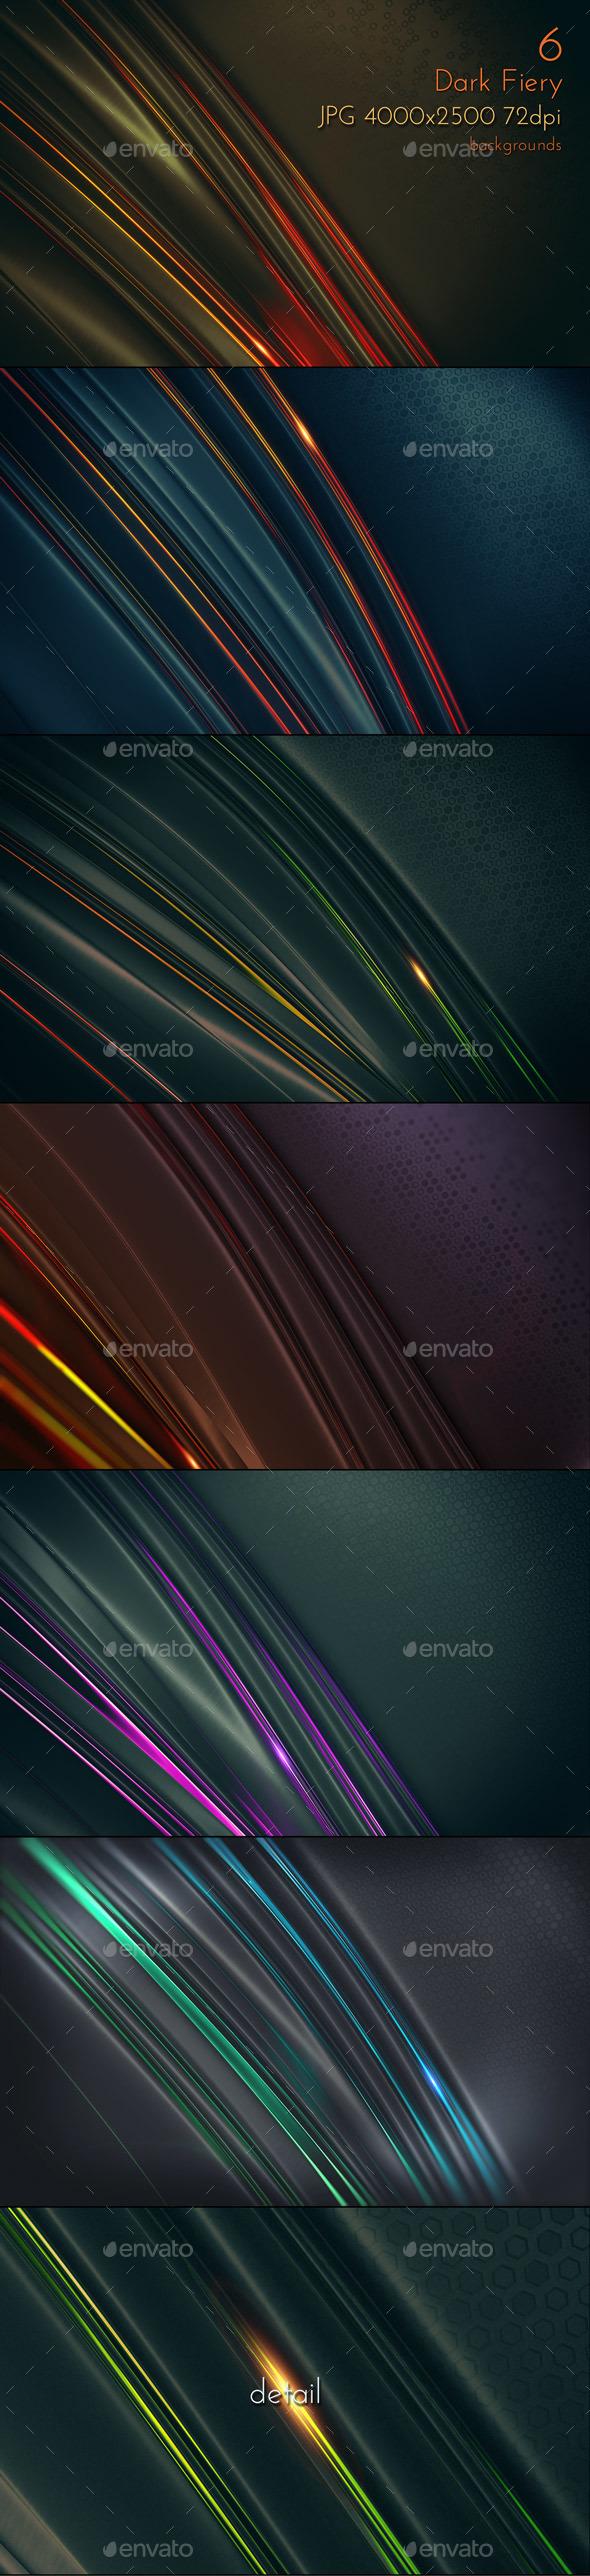 Dark Design Backgrounds - Tech / Futuristic Backgrounds